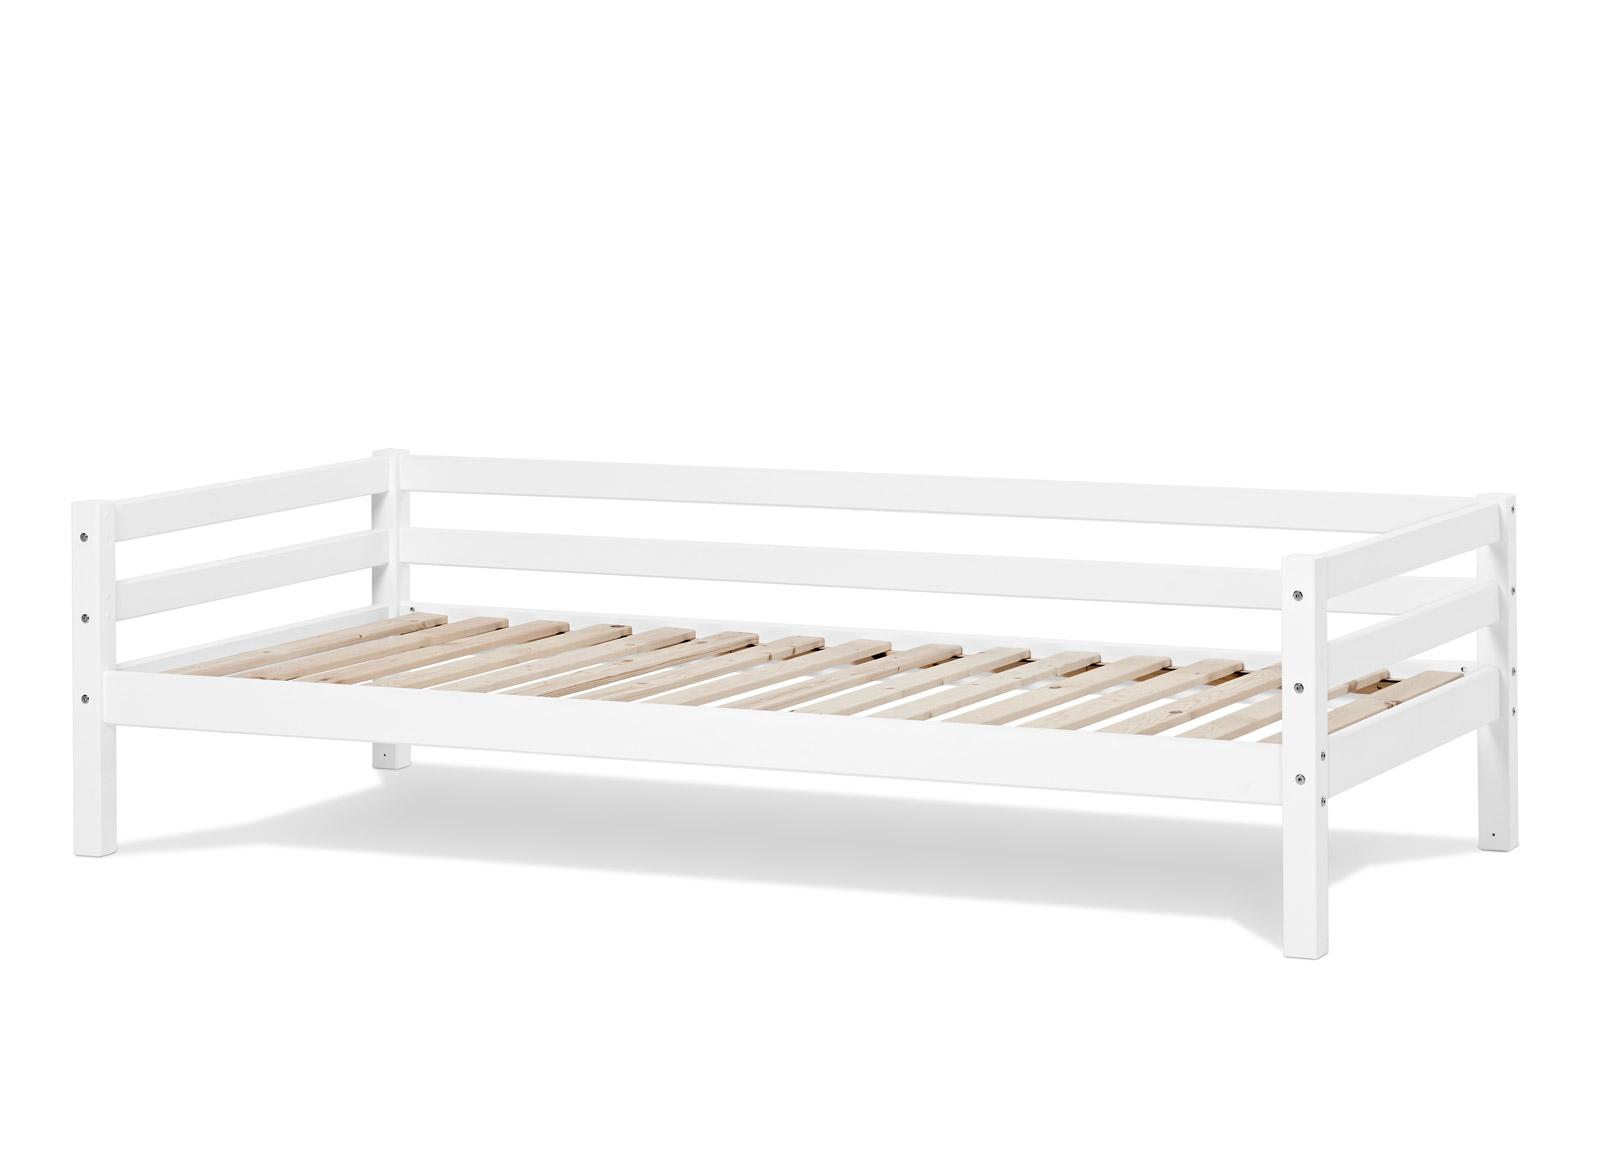 kinderbett 90x200 in kiefer massiv wei kids heaven. Black Bedroom Furniture Sets. Home Design Ideas